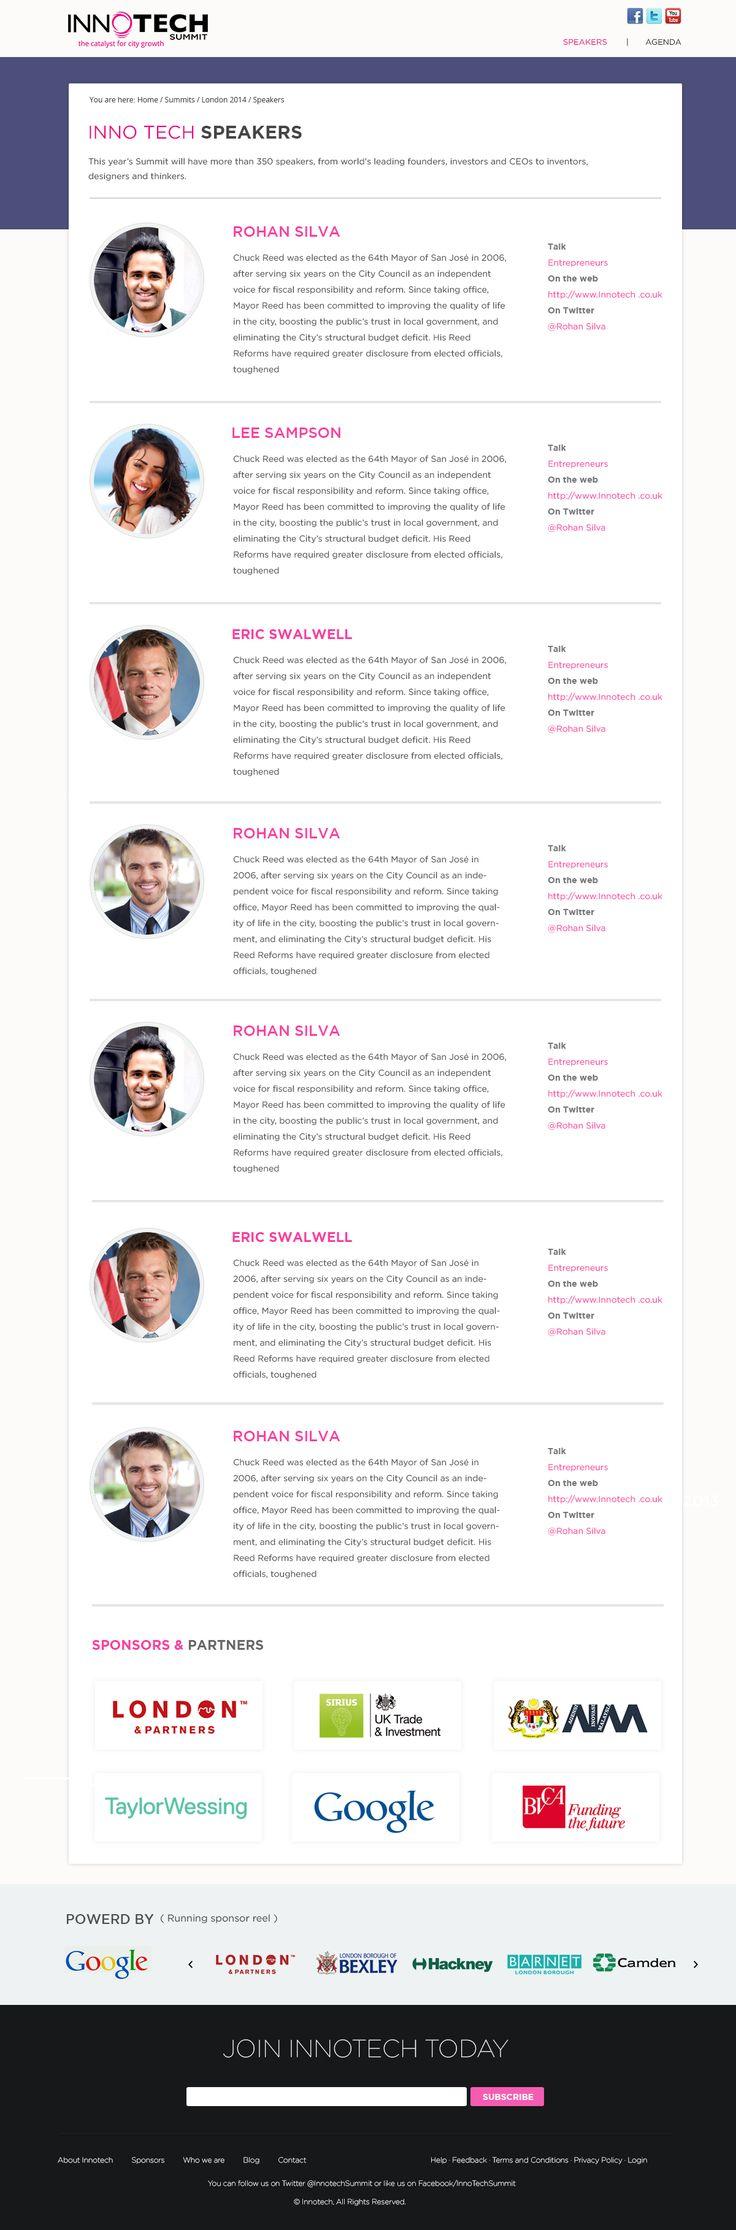 Design Inspiration Website Video